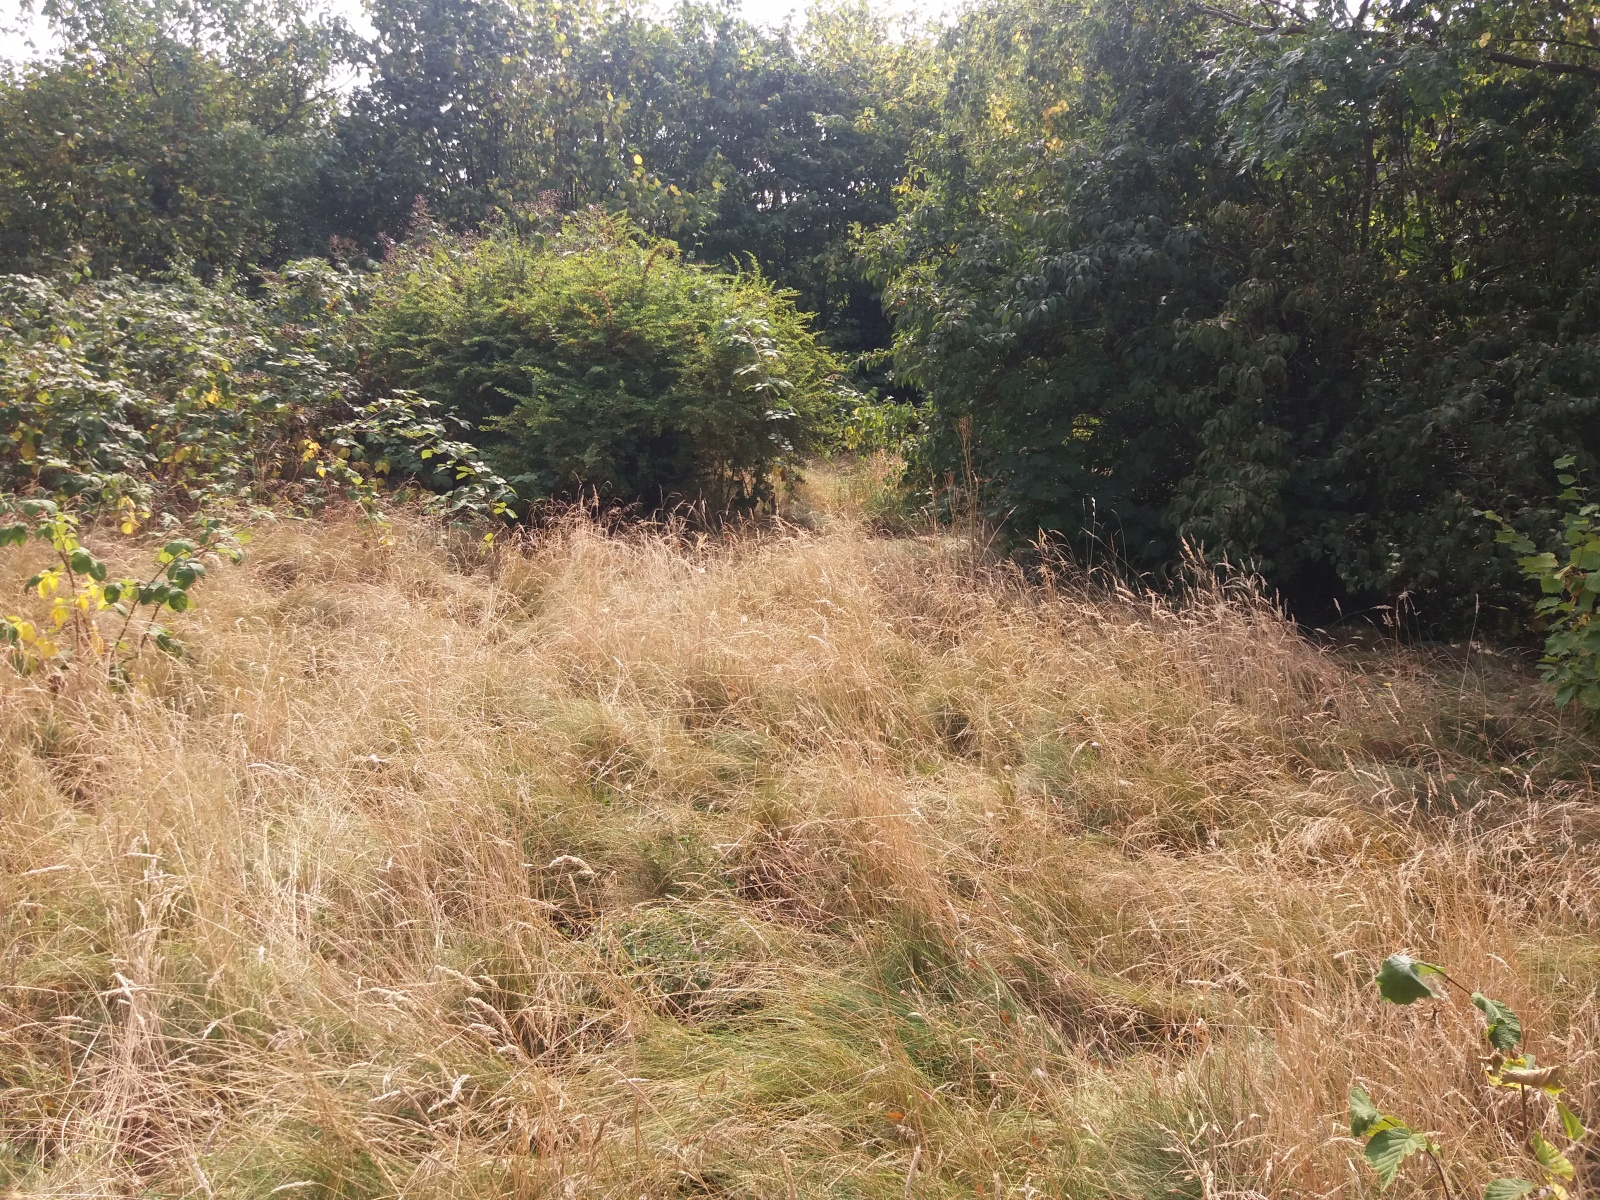 Land At Cross Lane, Bayston Hill, Shrewsbury, Shropshire